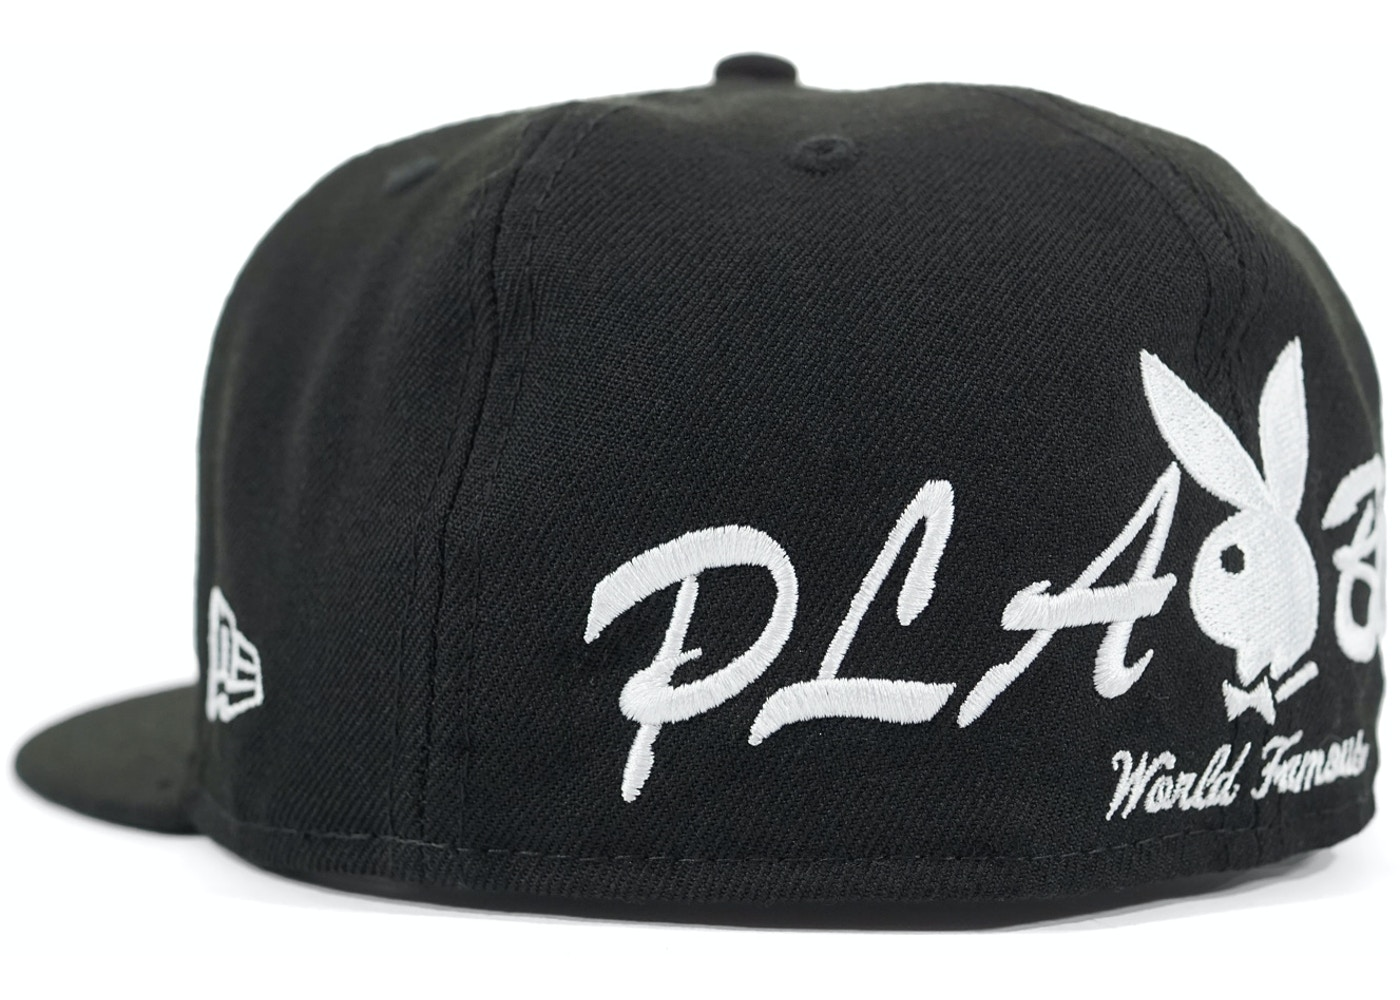 3b0bd7f1c7c Supreme Playboy Box Logo New Era Cap Black - SS17